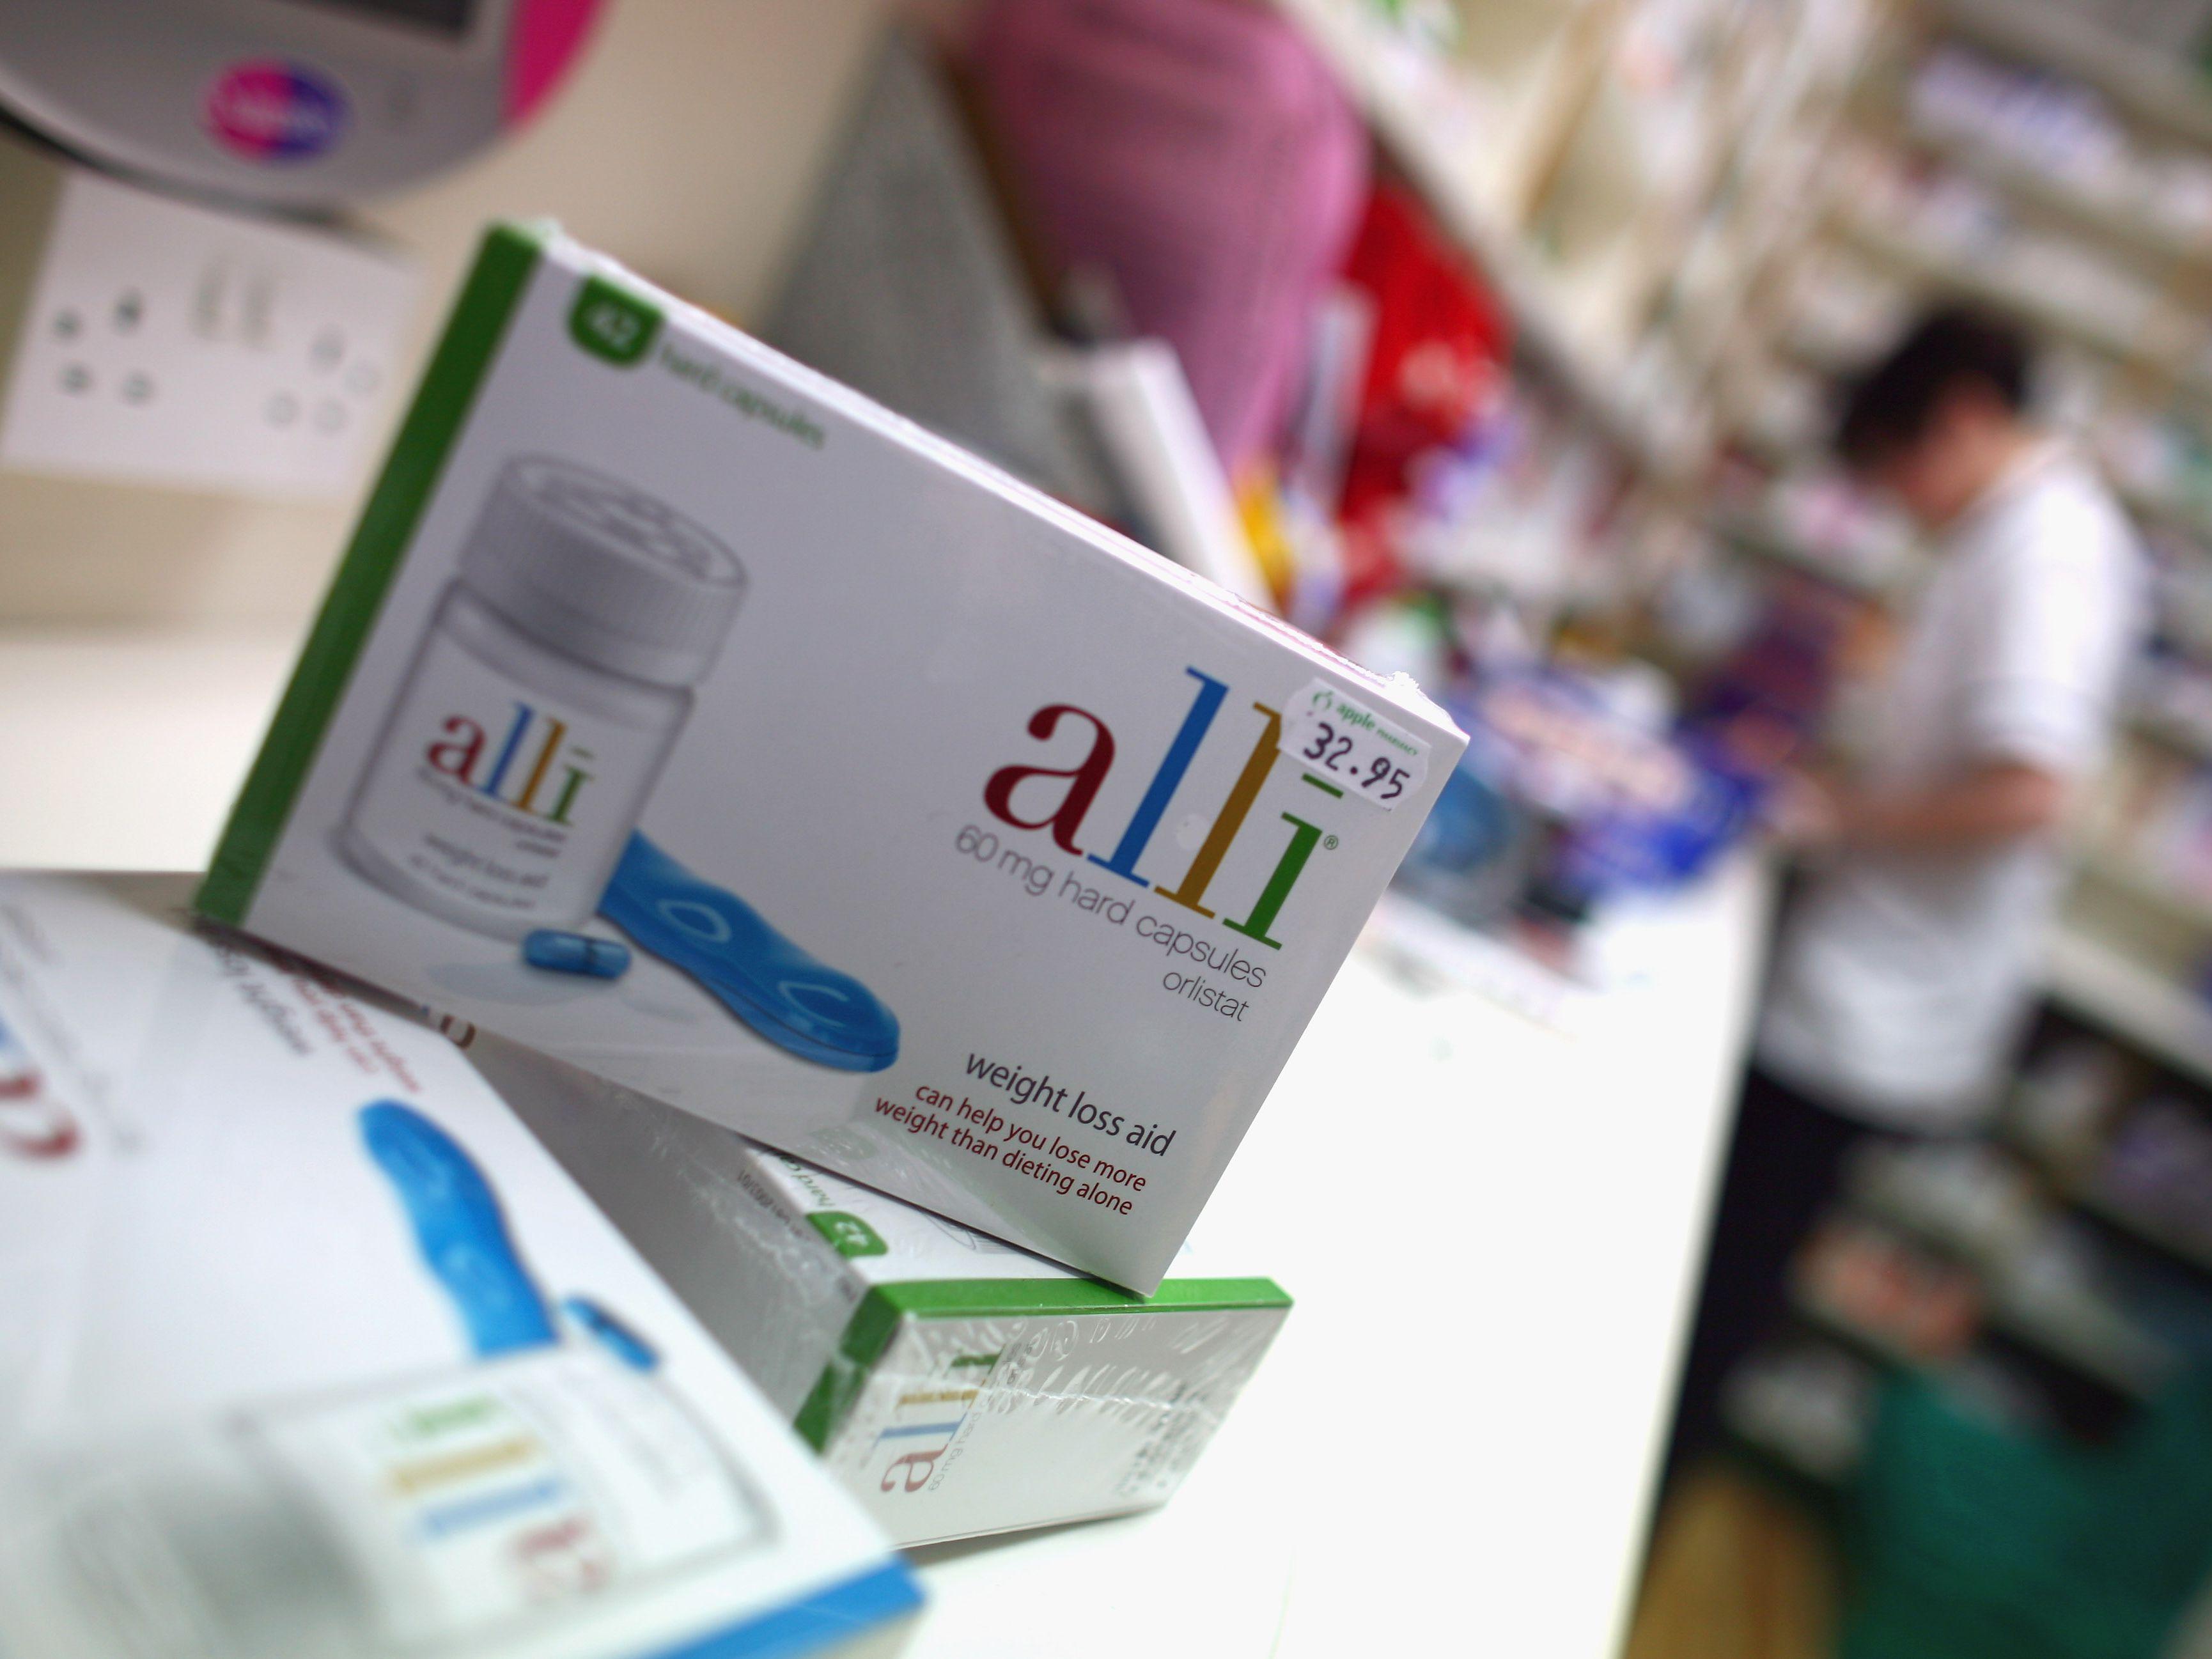 are alli diet pills prescribed?